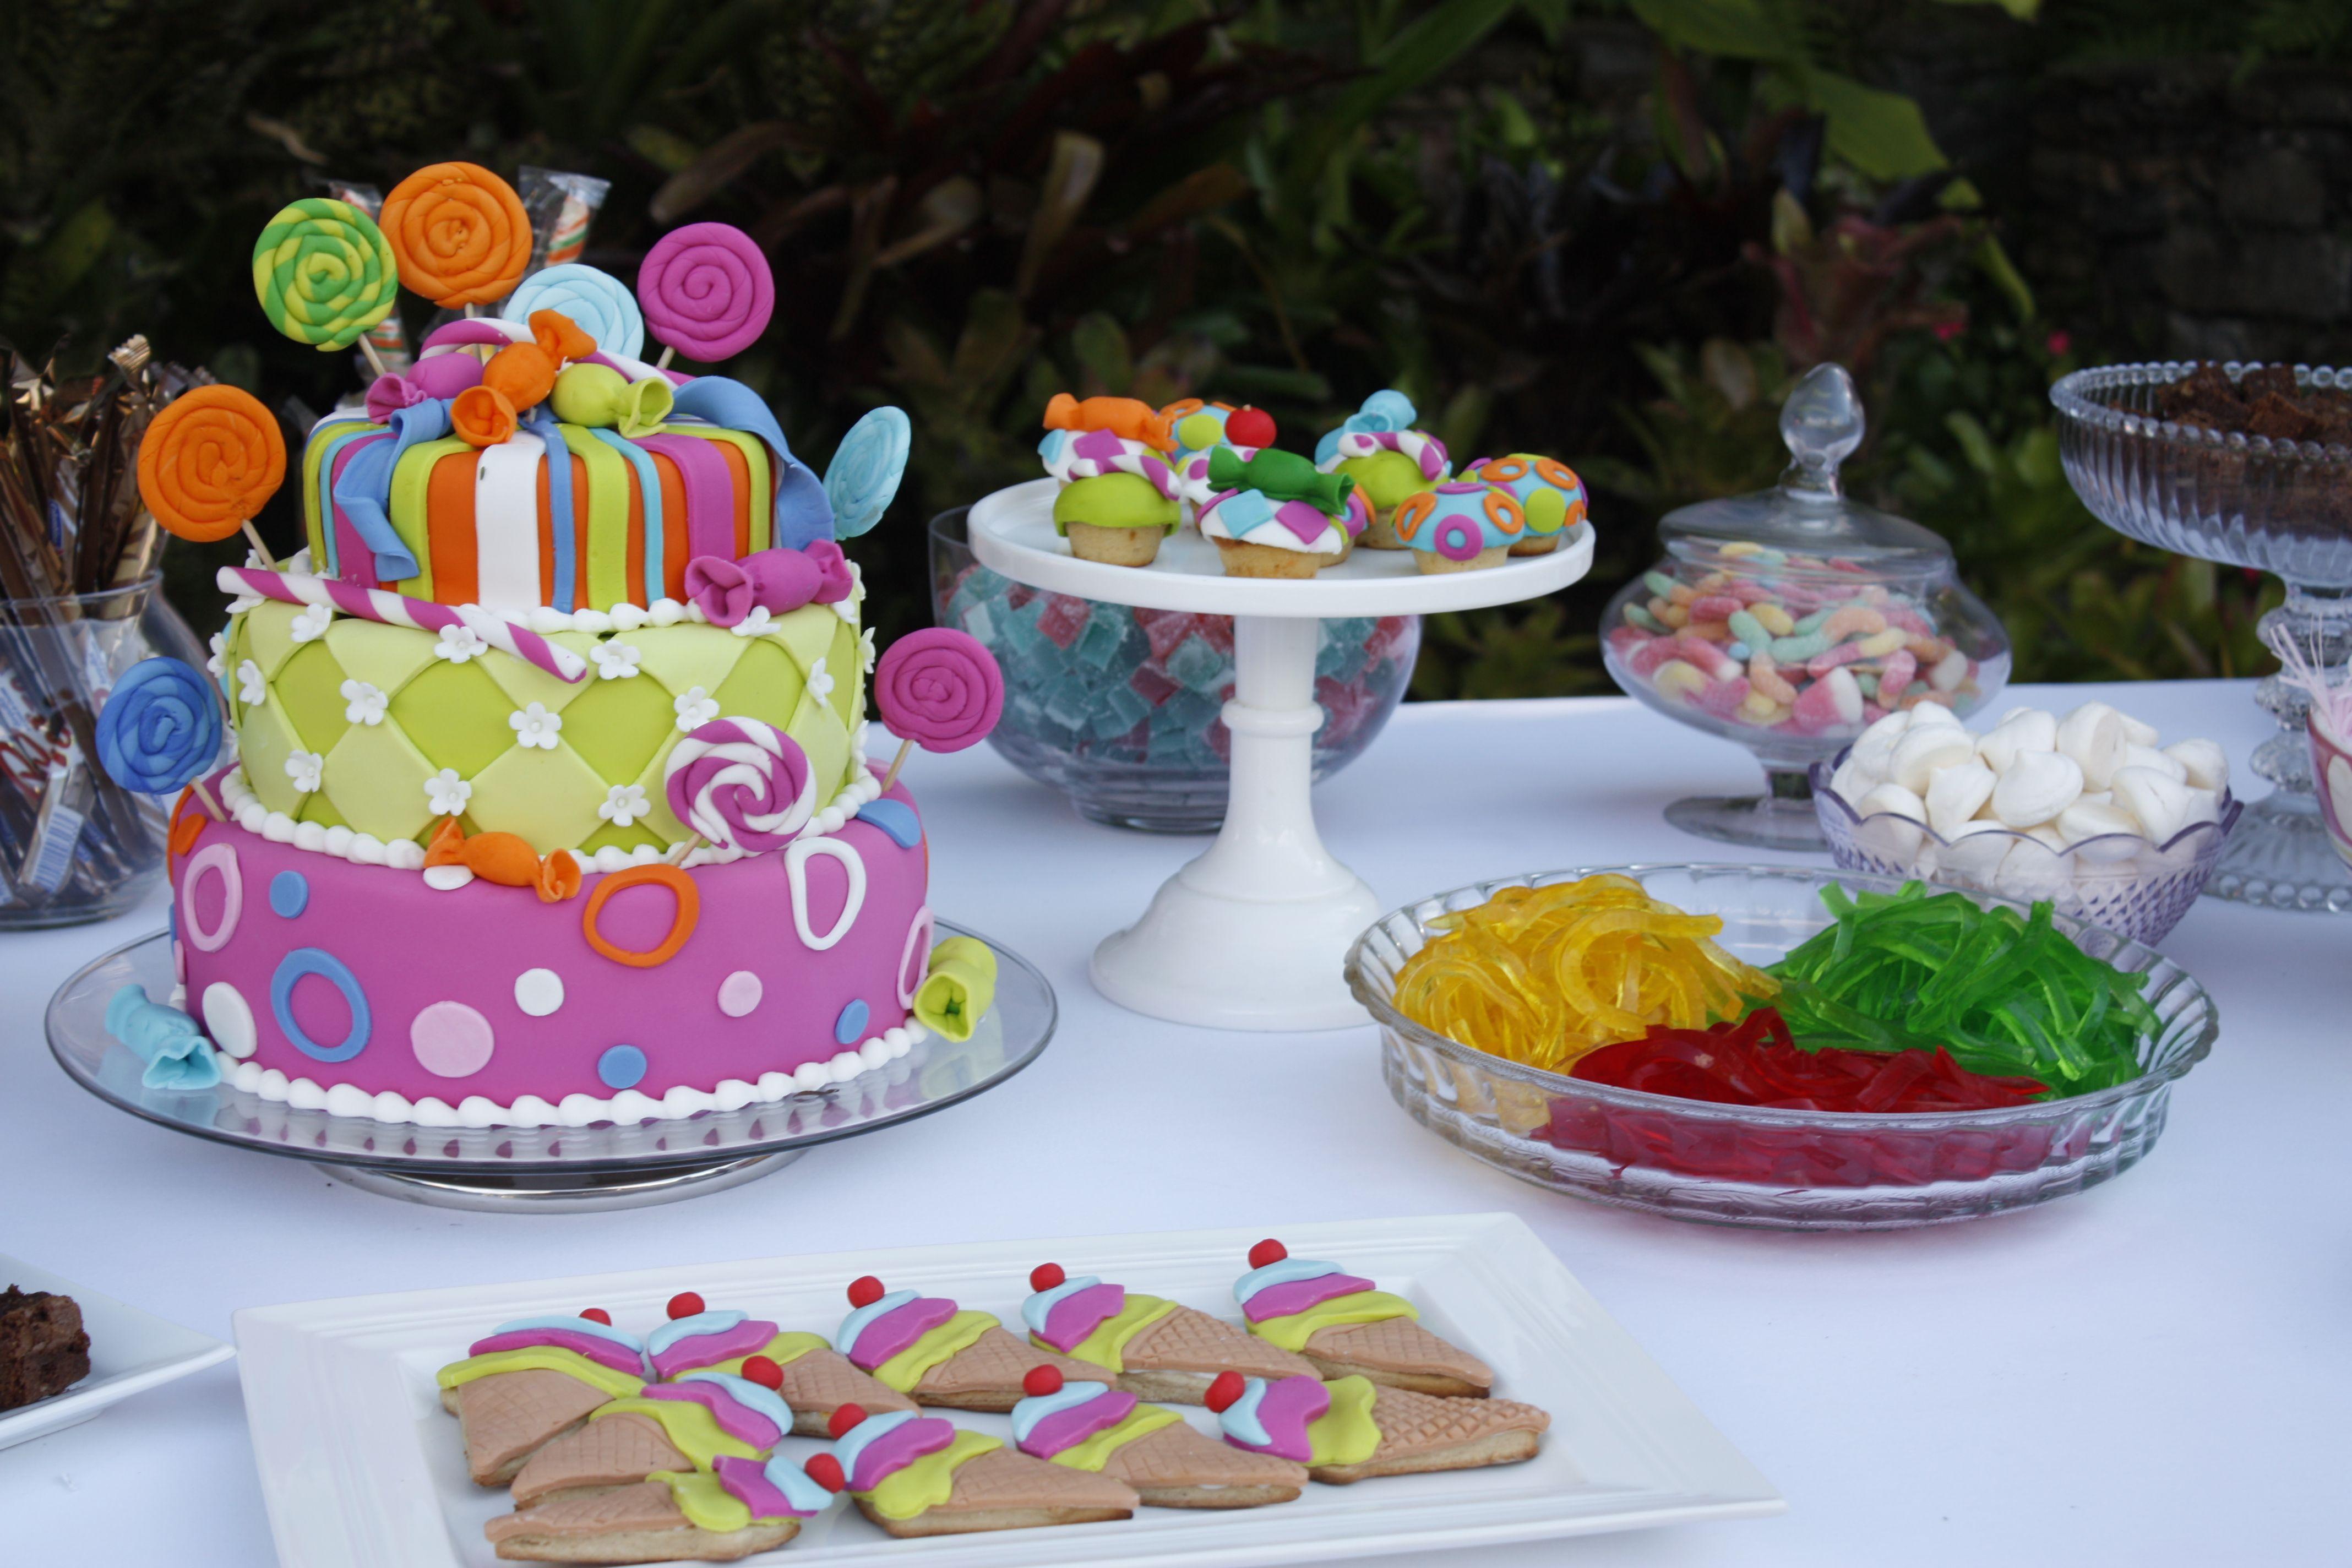 Torta y decoraci n de cumplea os infantil cumplea os party cakes more y cake Mesa de cumpleanos infantil